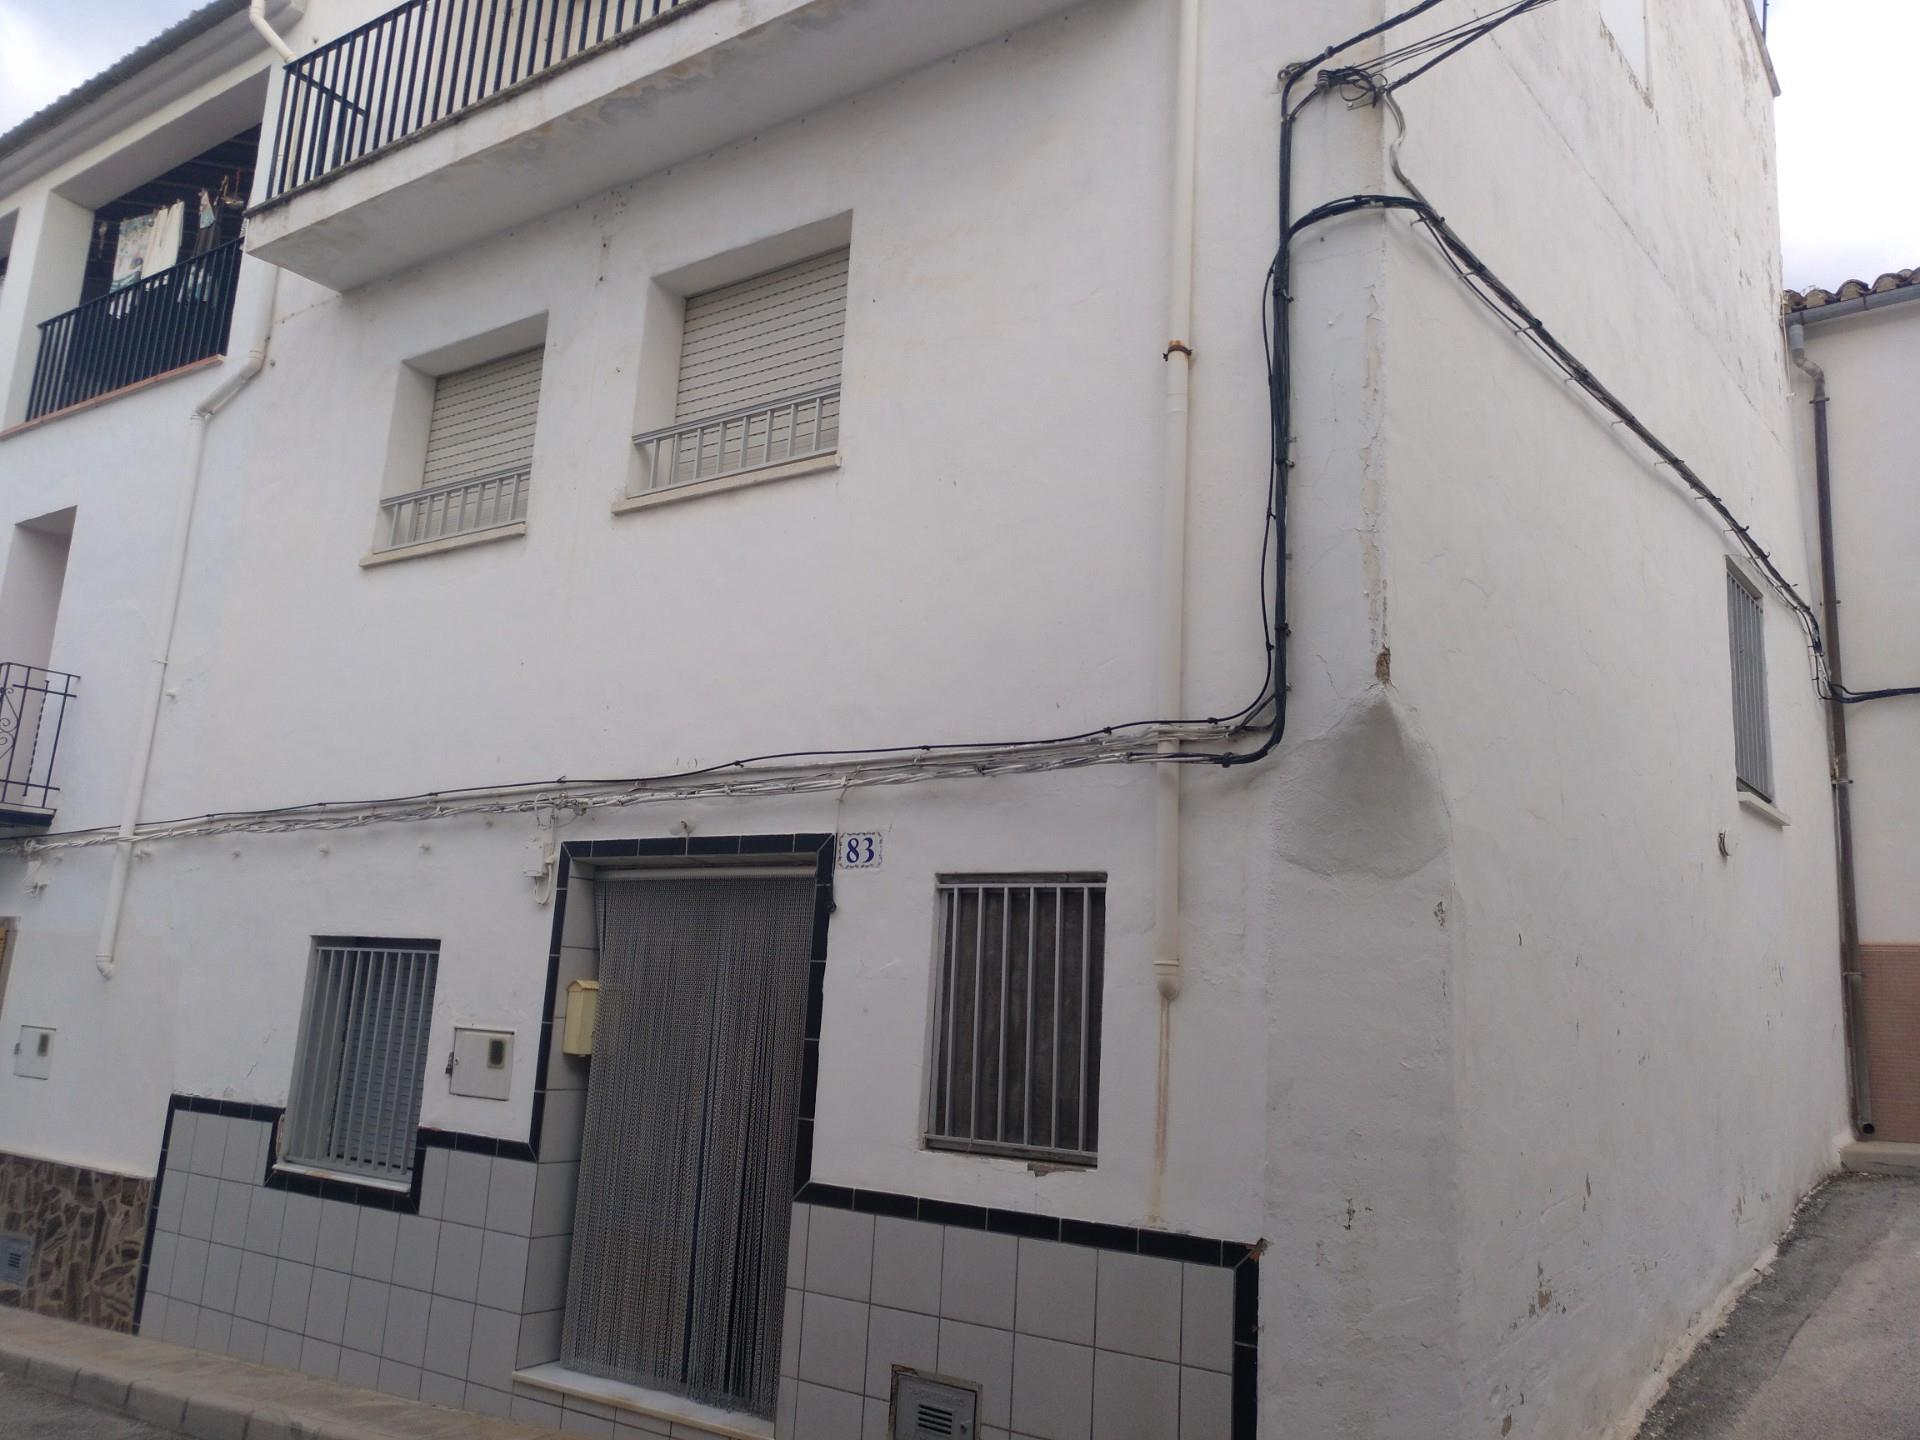 Casa adosada  Calle cueva santa. Beniarrés / calle cueva santa